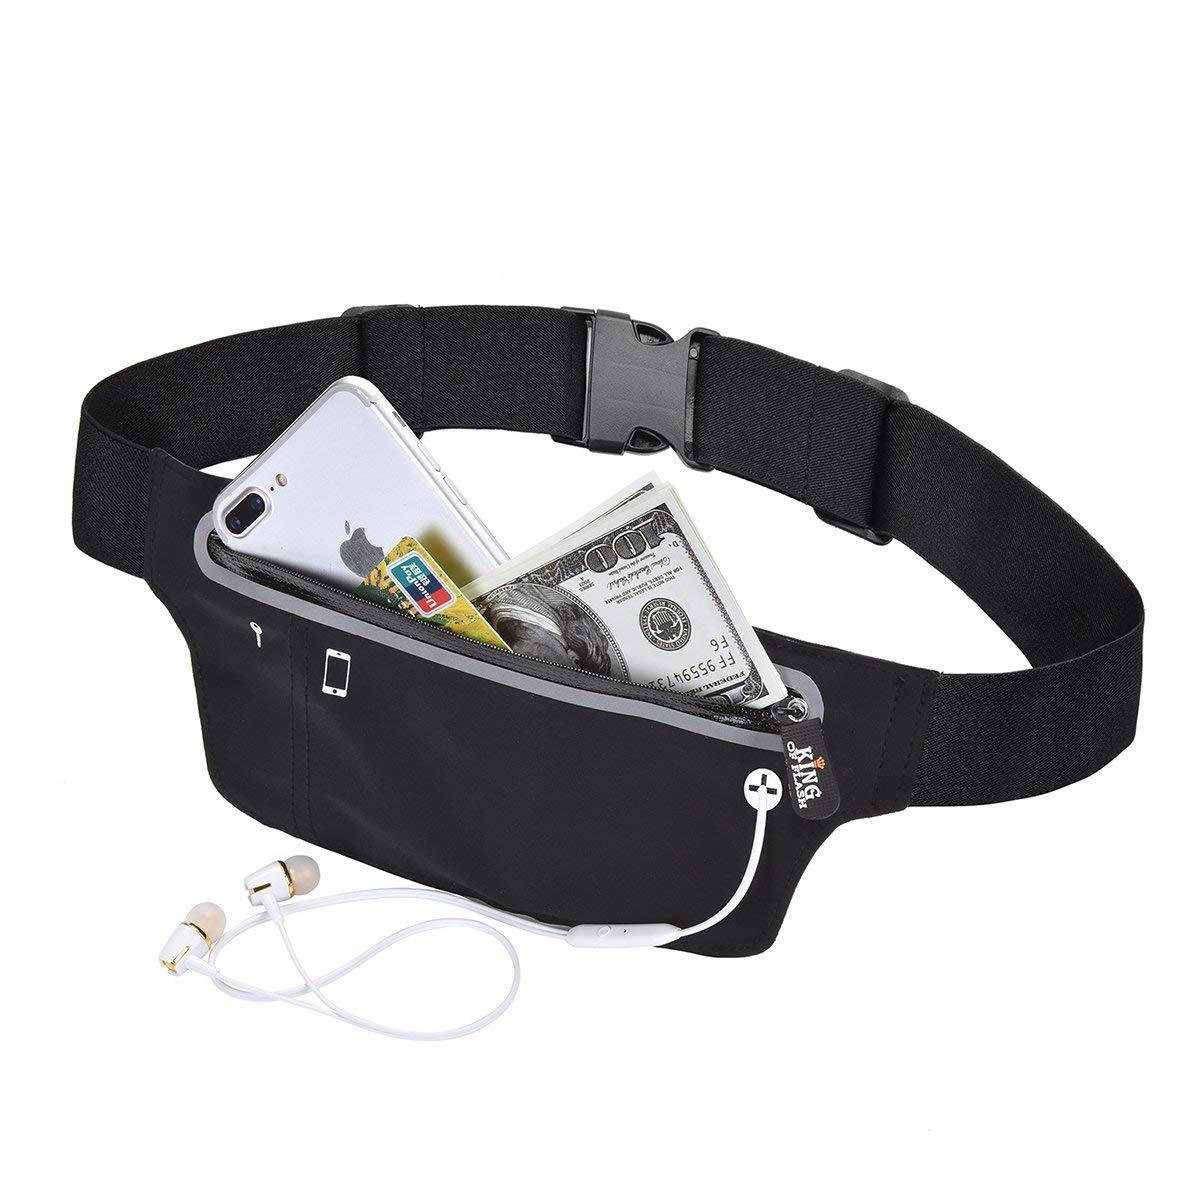 Unisex Waist Belt Bum Bag Jogging Running GYM Travel Pouch Keys Mobile Money